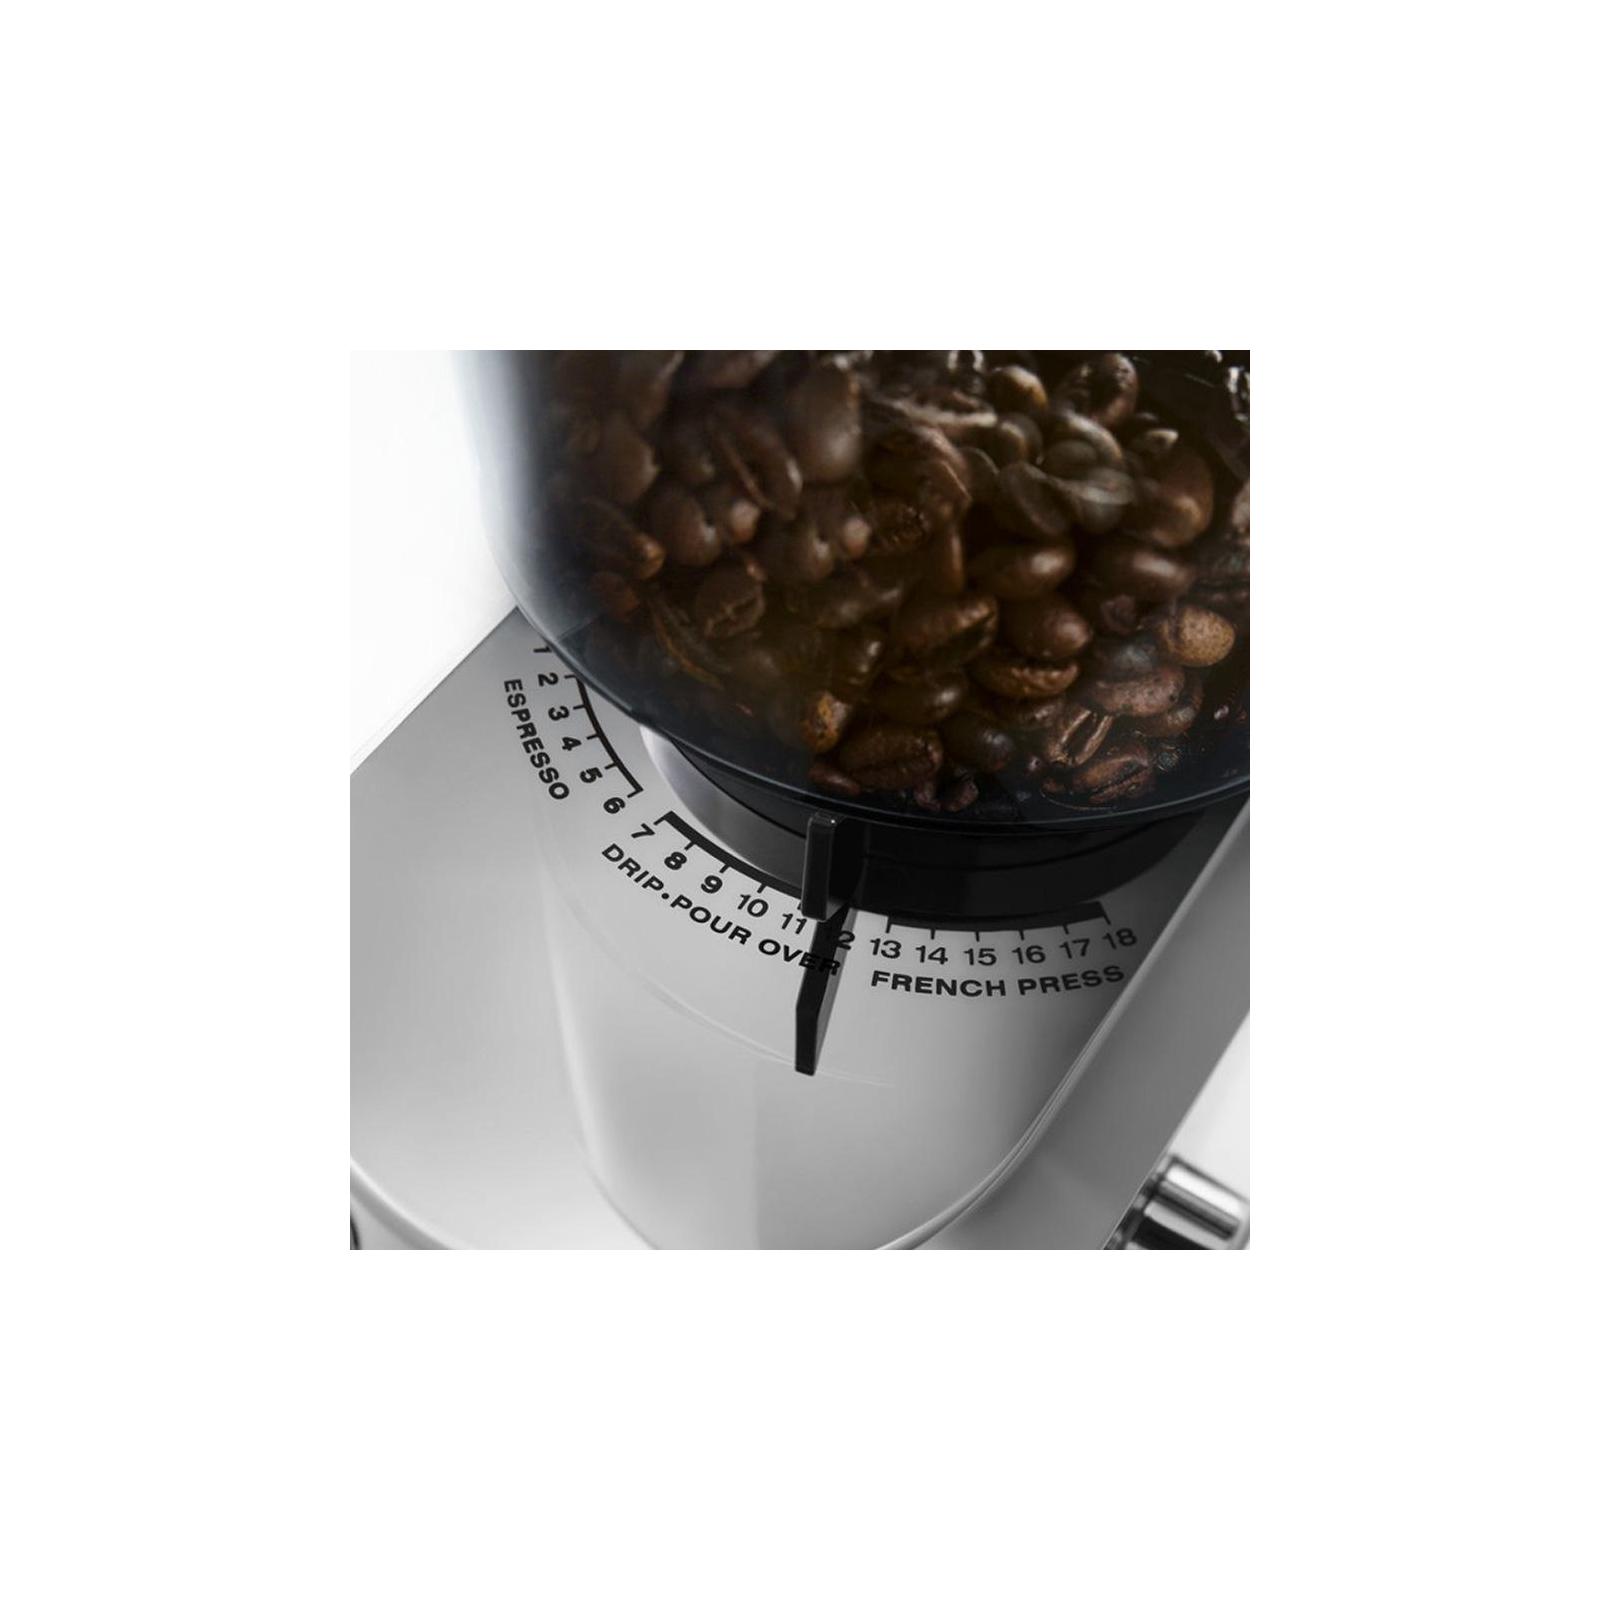 Кофемолка DeLonghi KG 520 M изображение 4